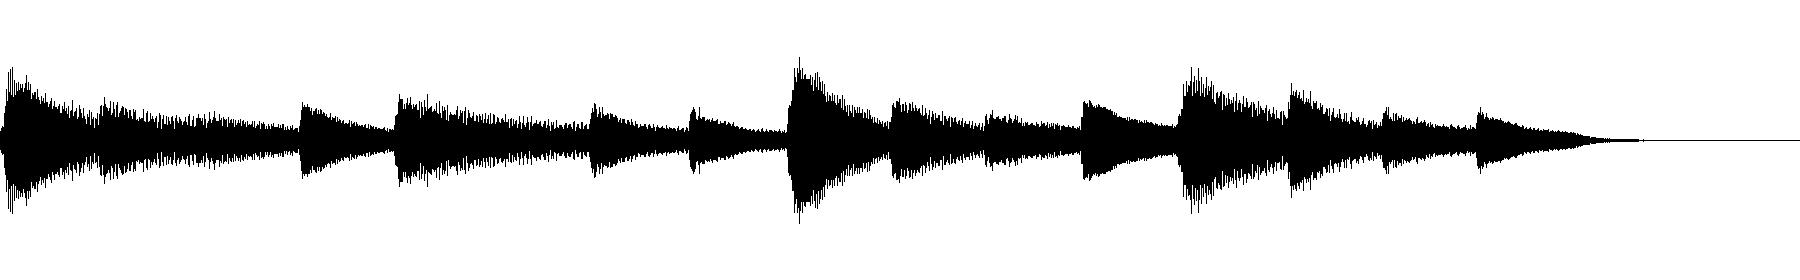 pattern 1 7